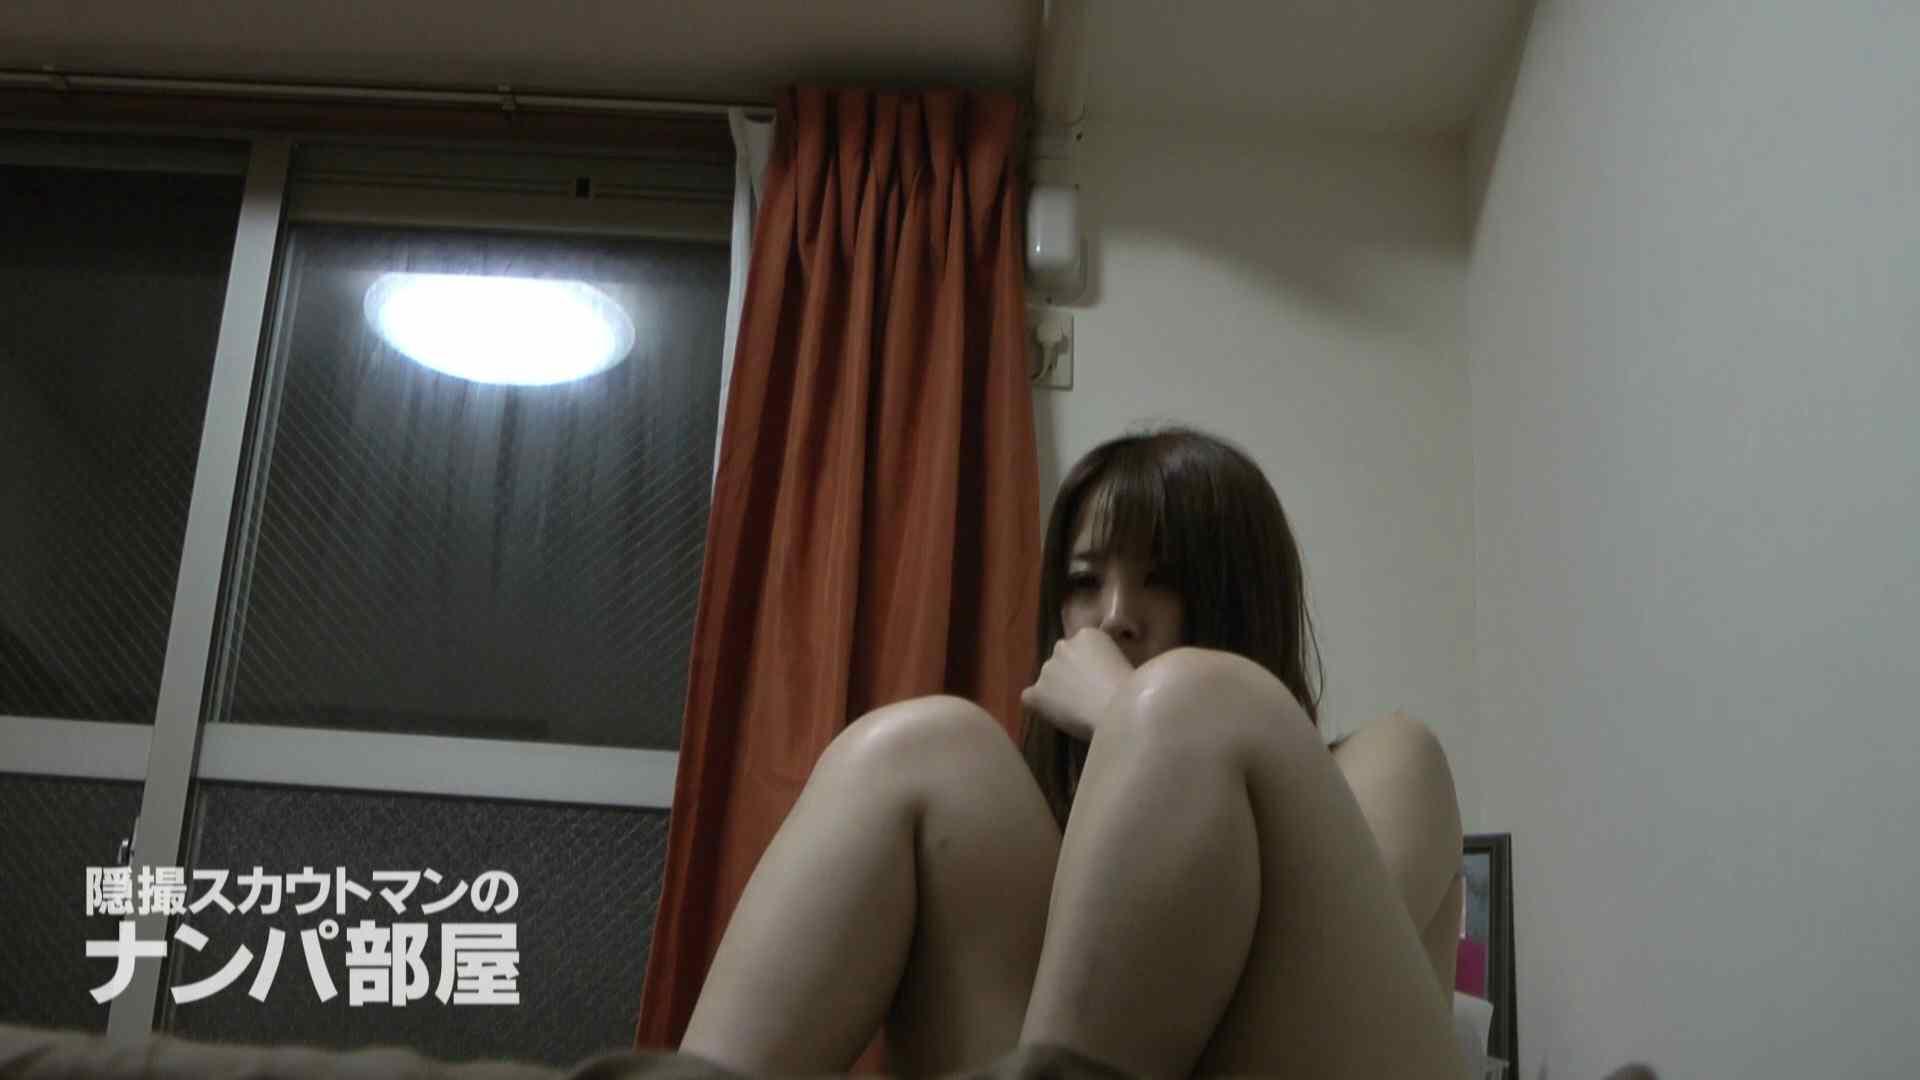 vol.2 kana 脱衣所・着替え編 | ナンパ  65pic 13